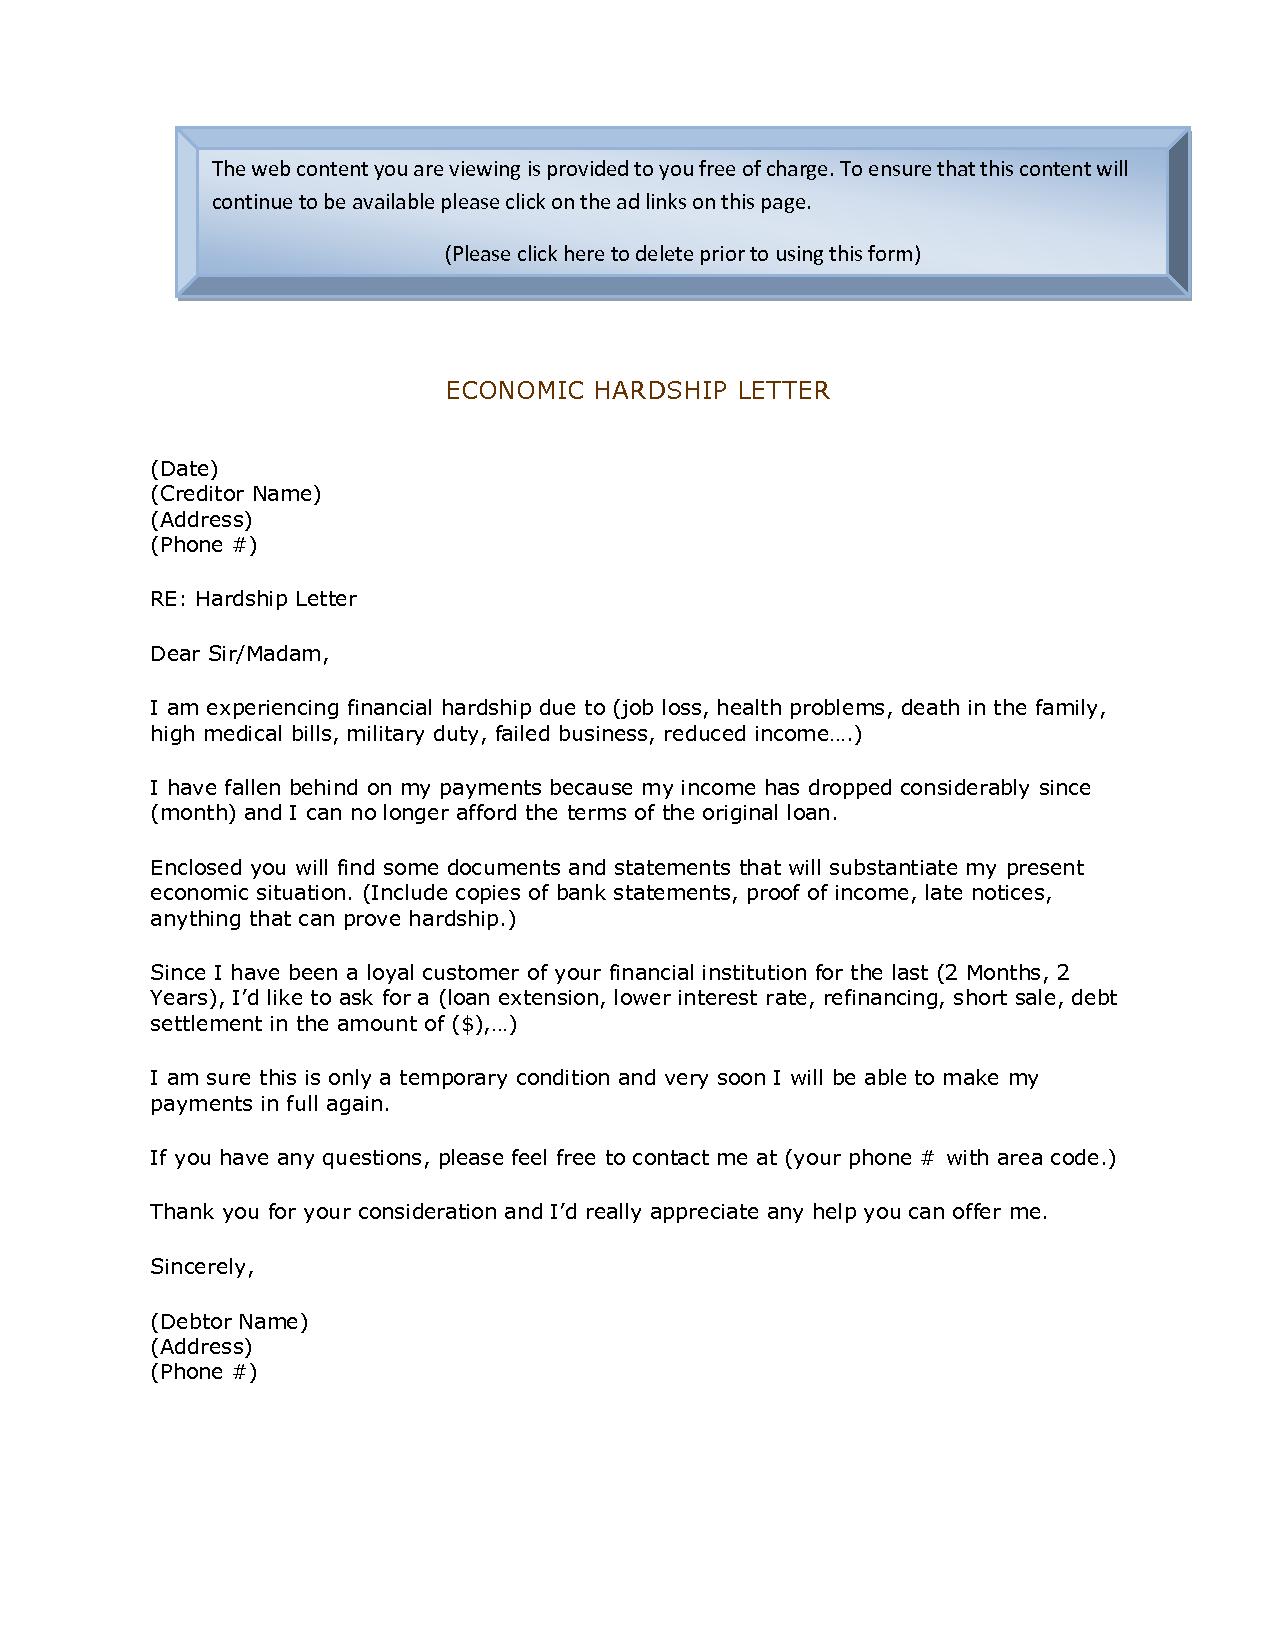 Economic Hardship Sample Letter